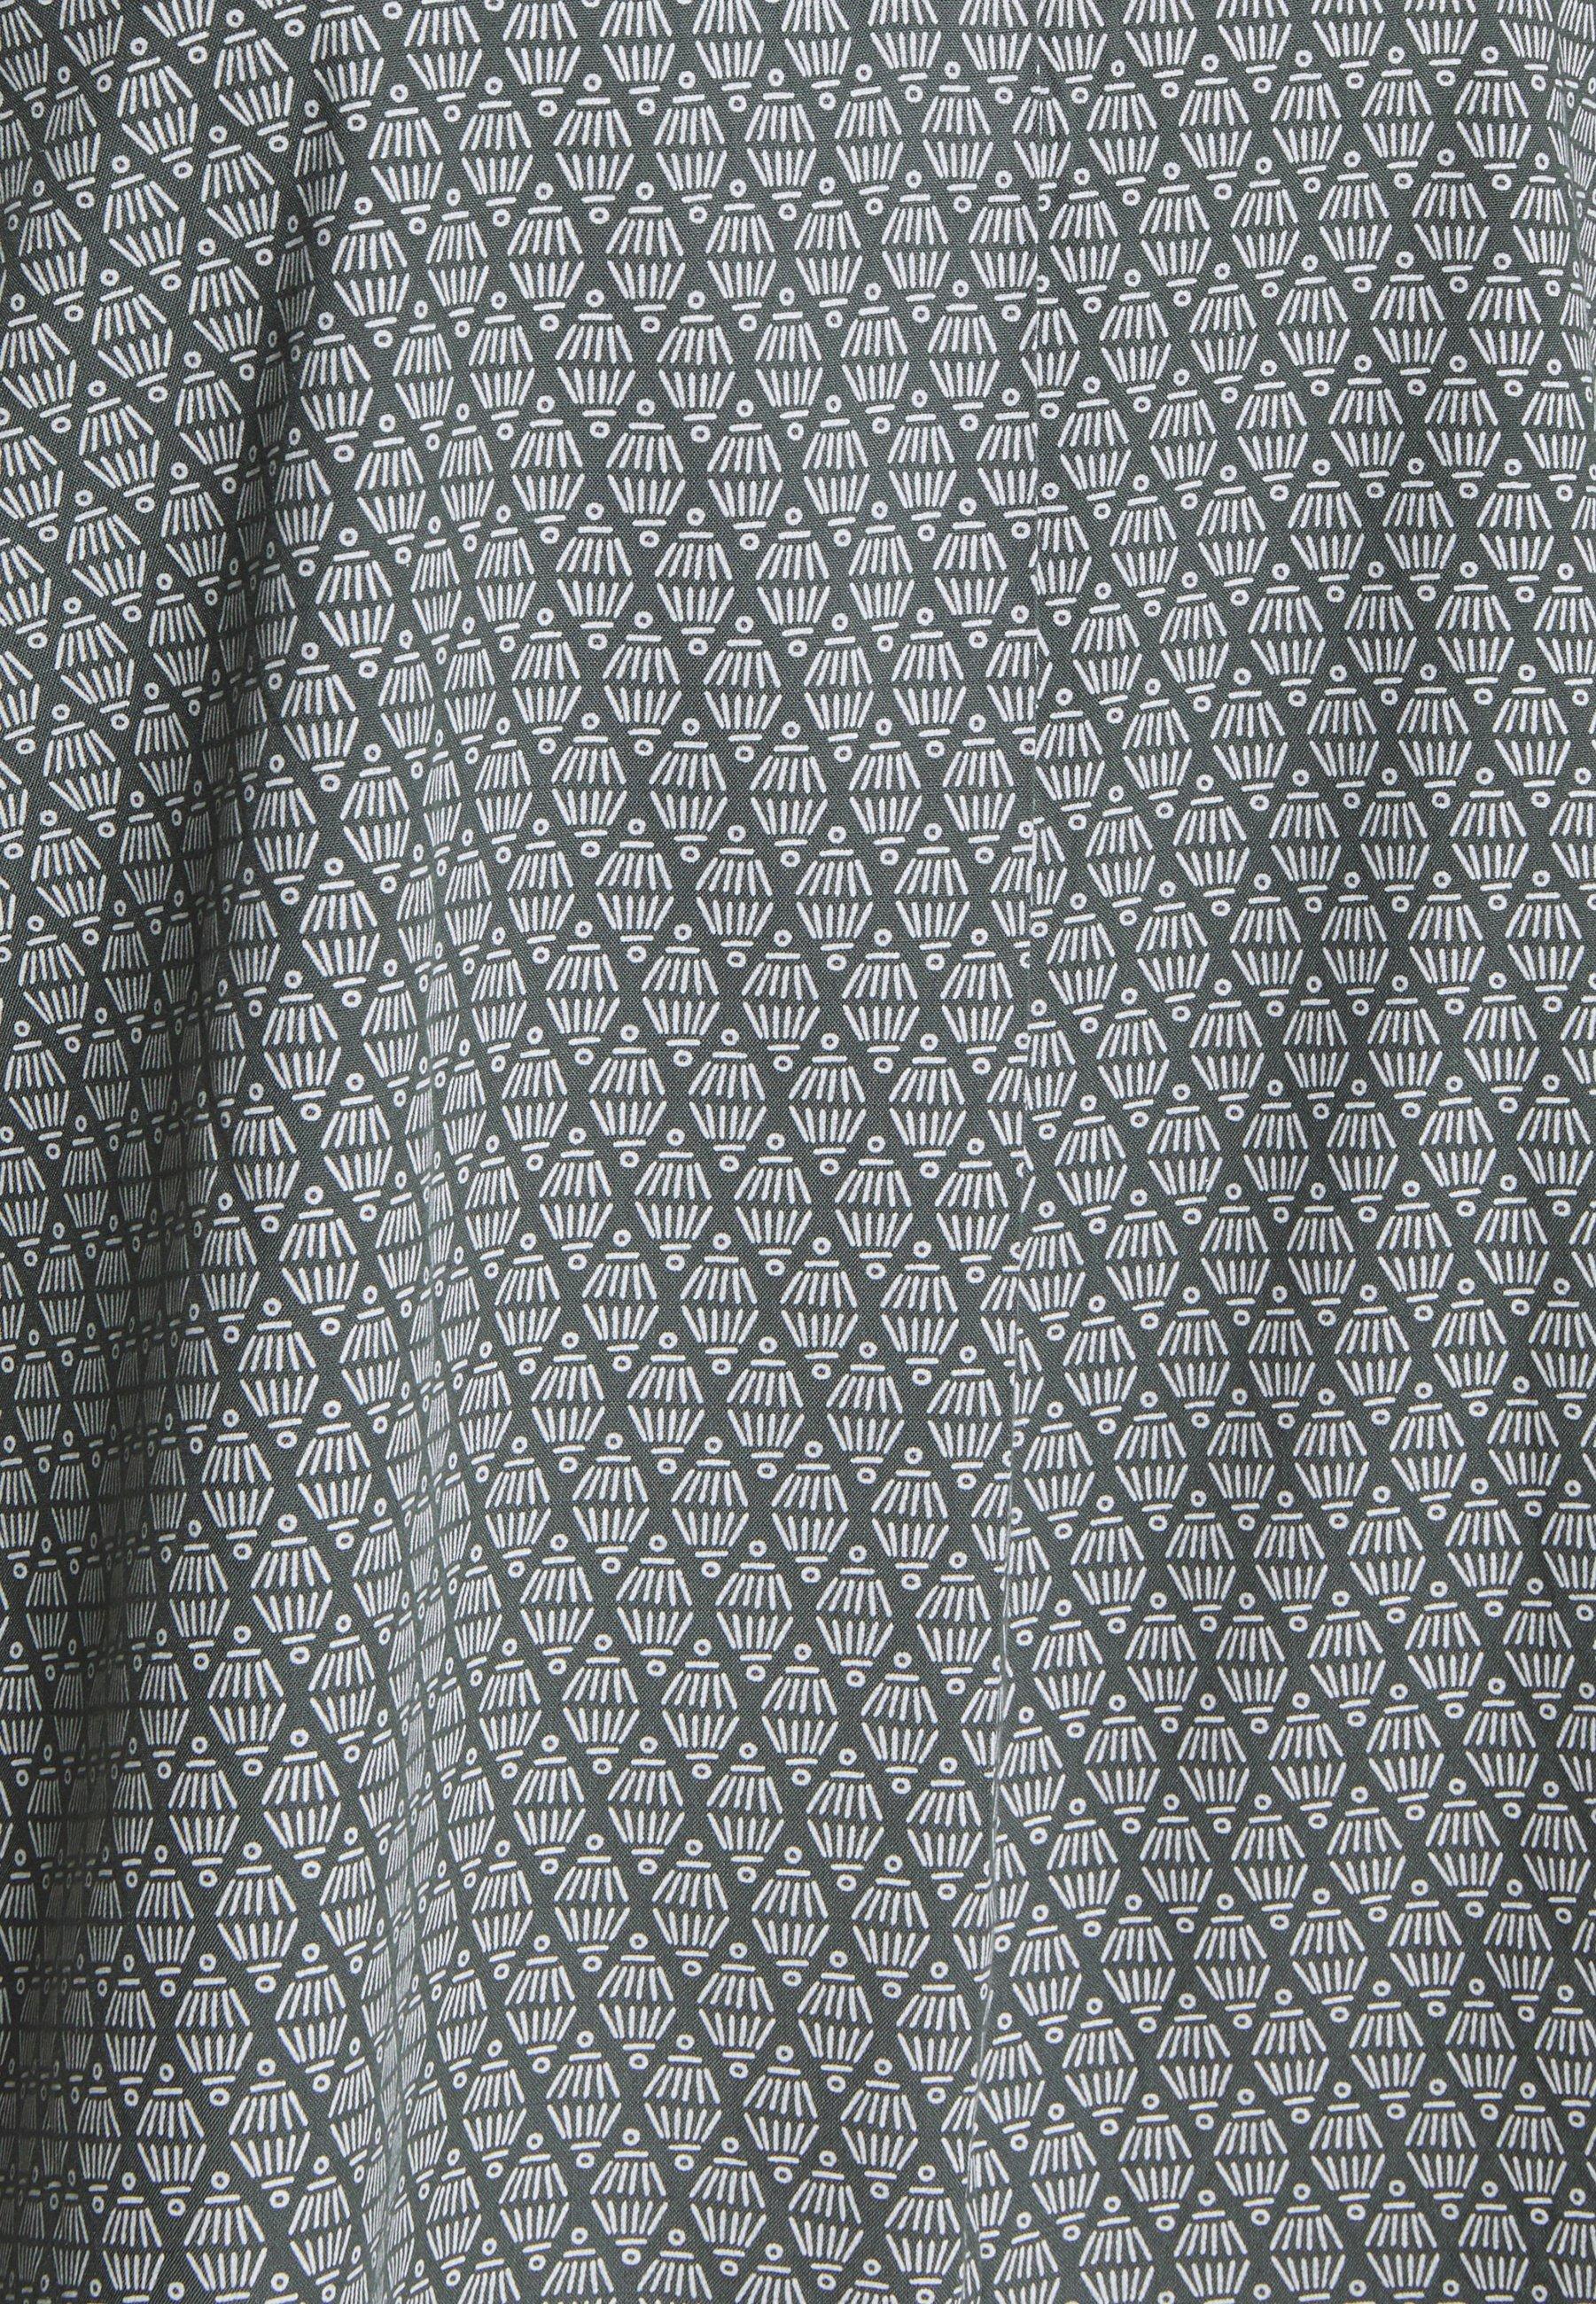 Sammlungen Damen Bekleidung HSD56659fjiodI Re.draft PRINTED Bluse olive khaki